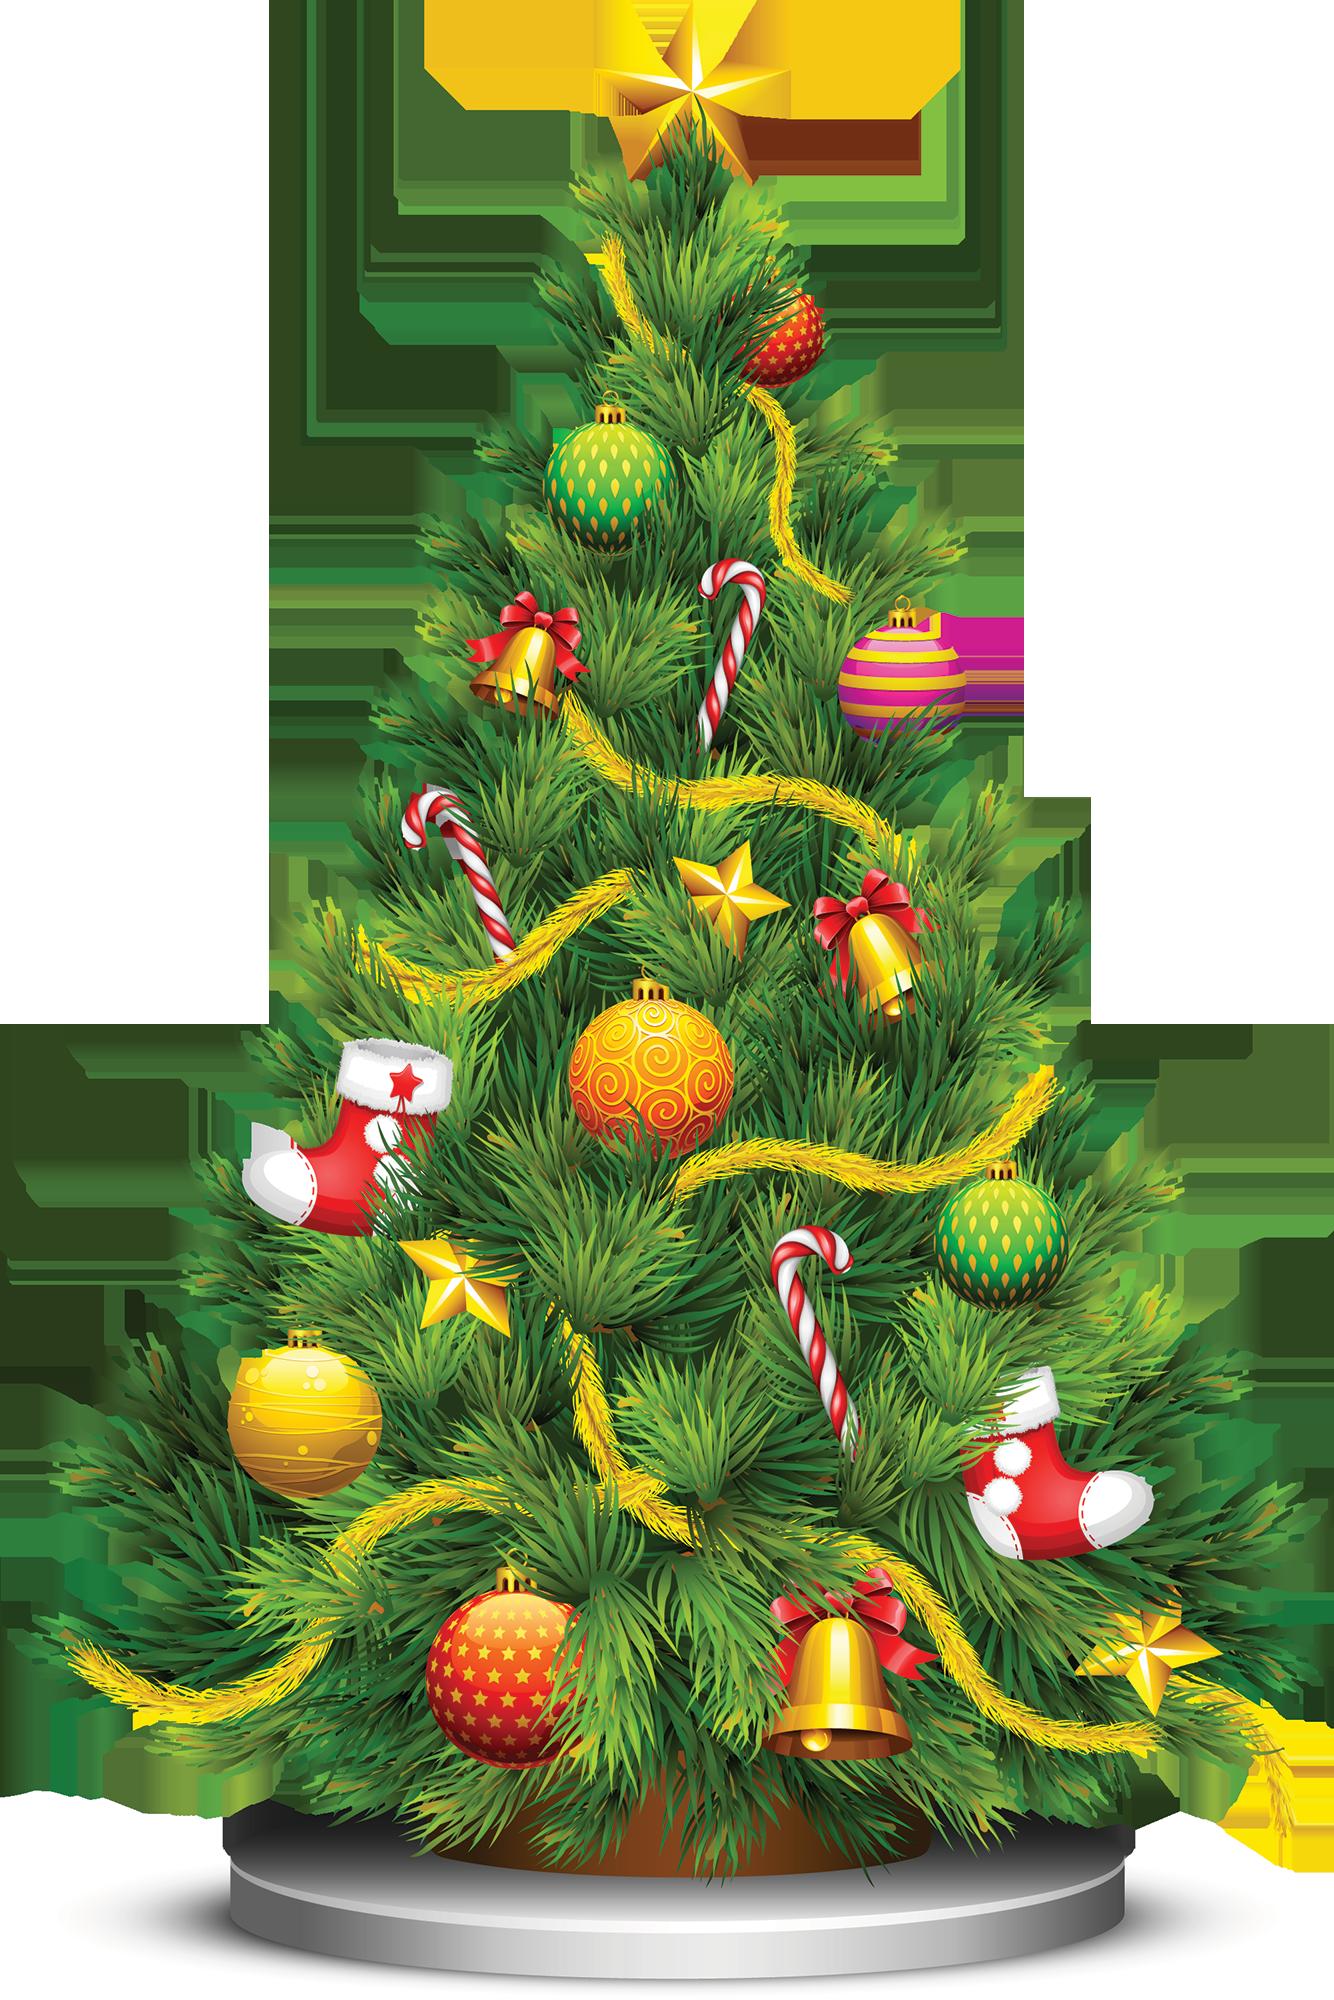 Rockin around the christmas tree clipart graphic transparent Pin by Dara Tata on КЛИПАРТ - новогодний | Pinterest | Christmas ... graphic transparent